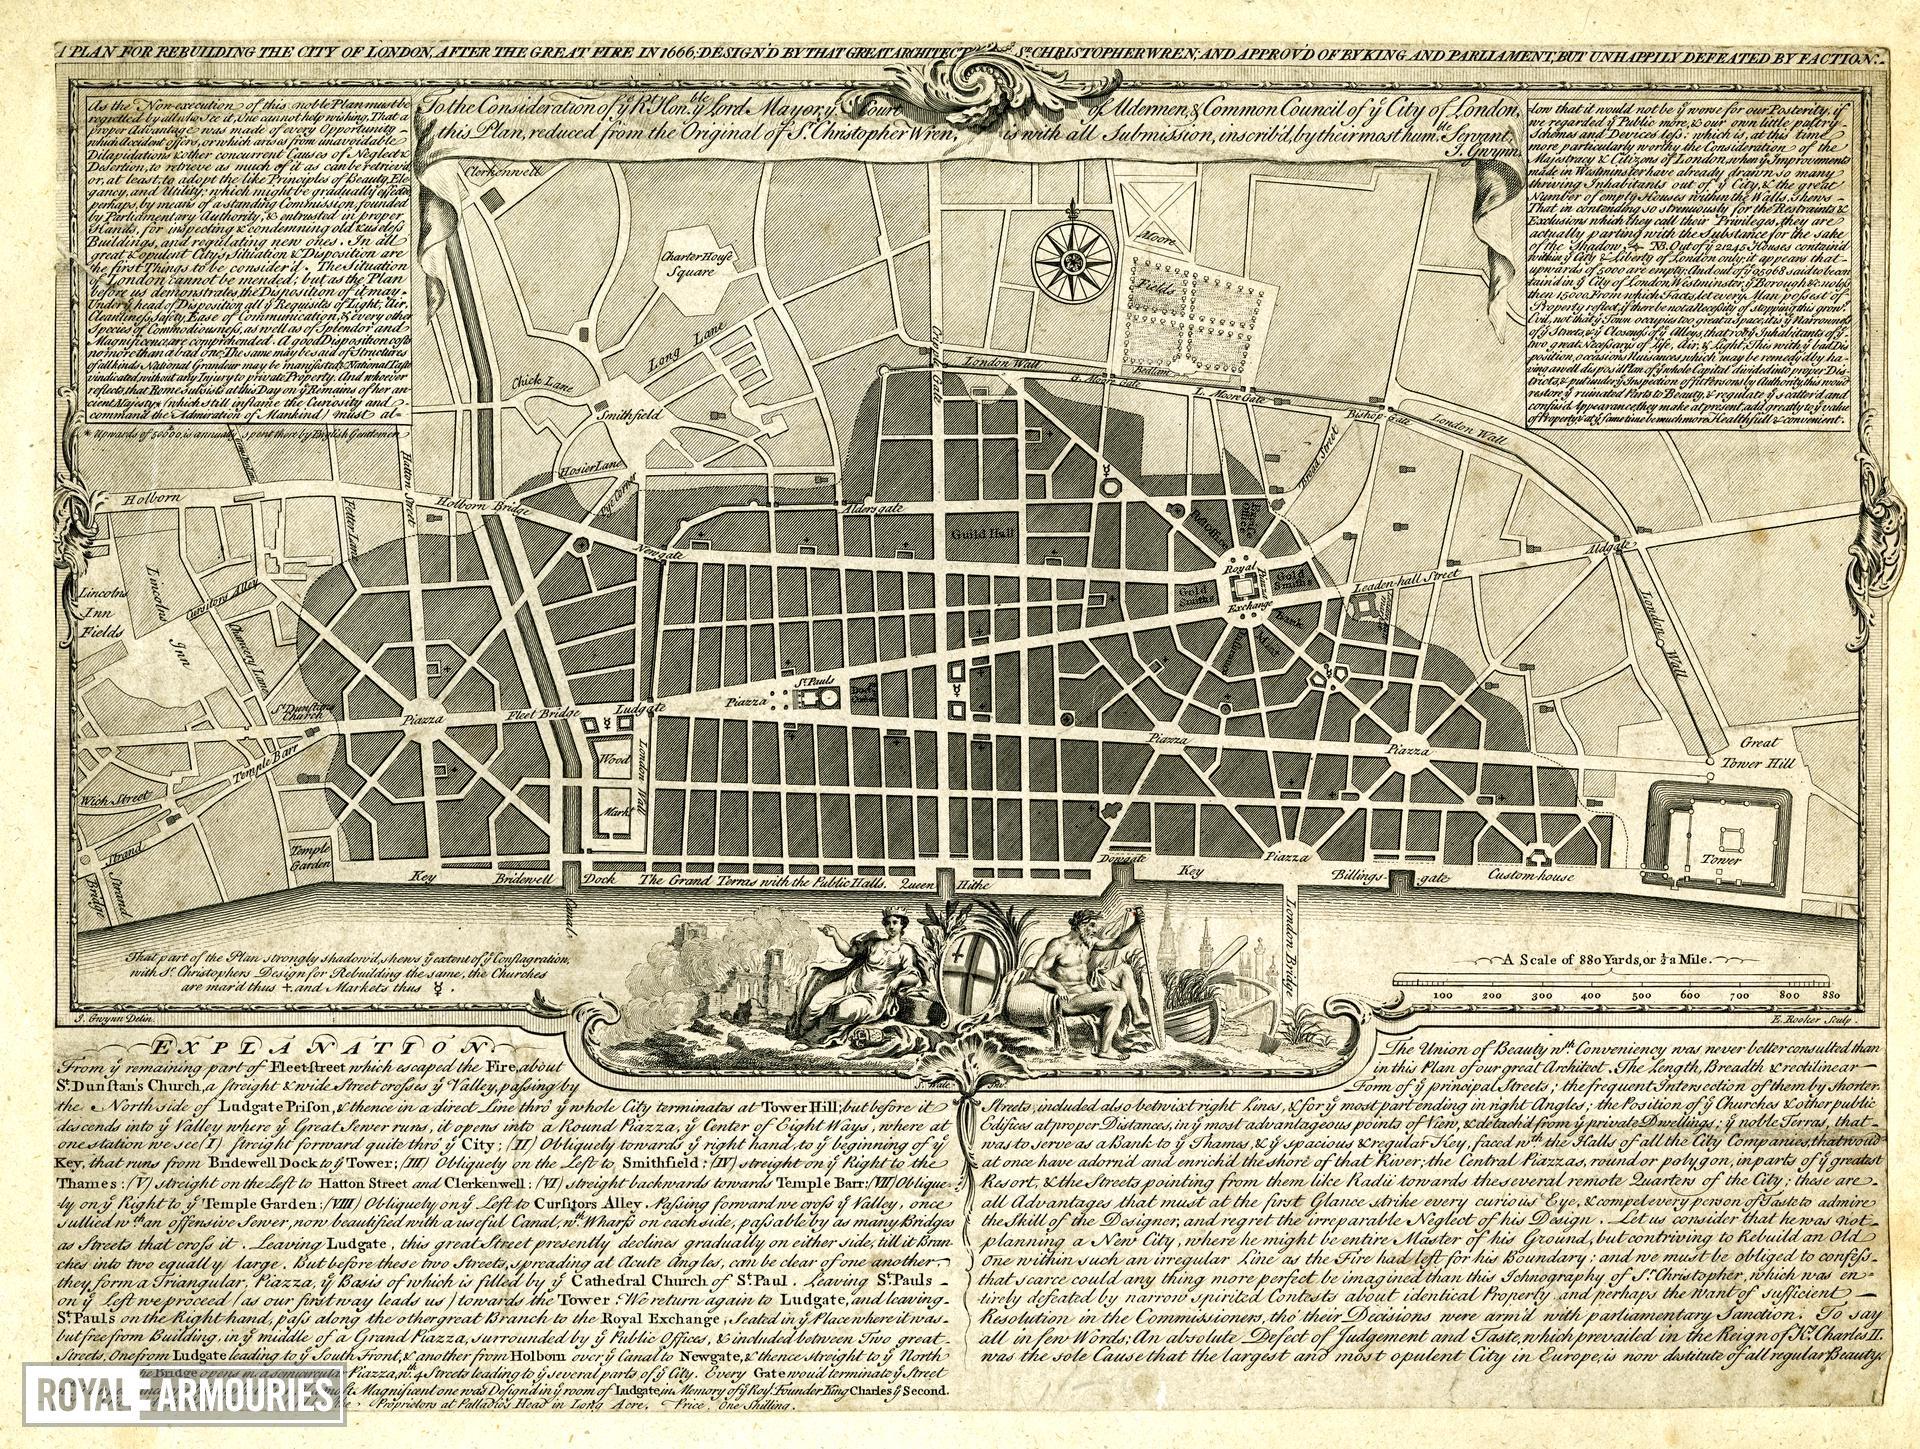 Plan of City of London